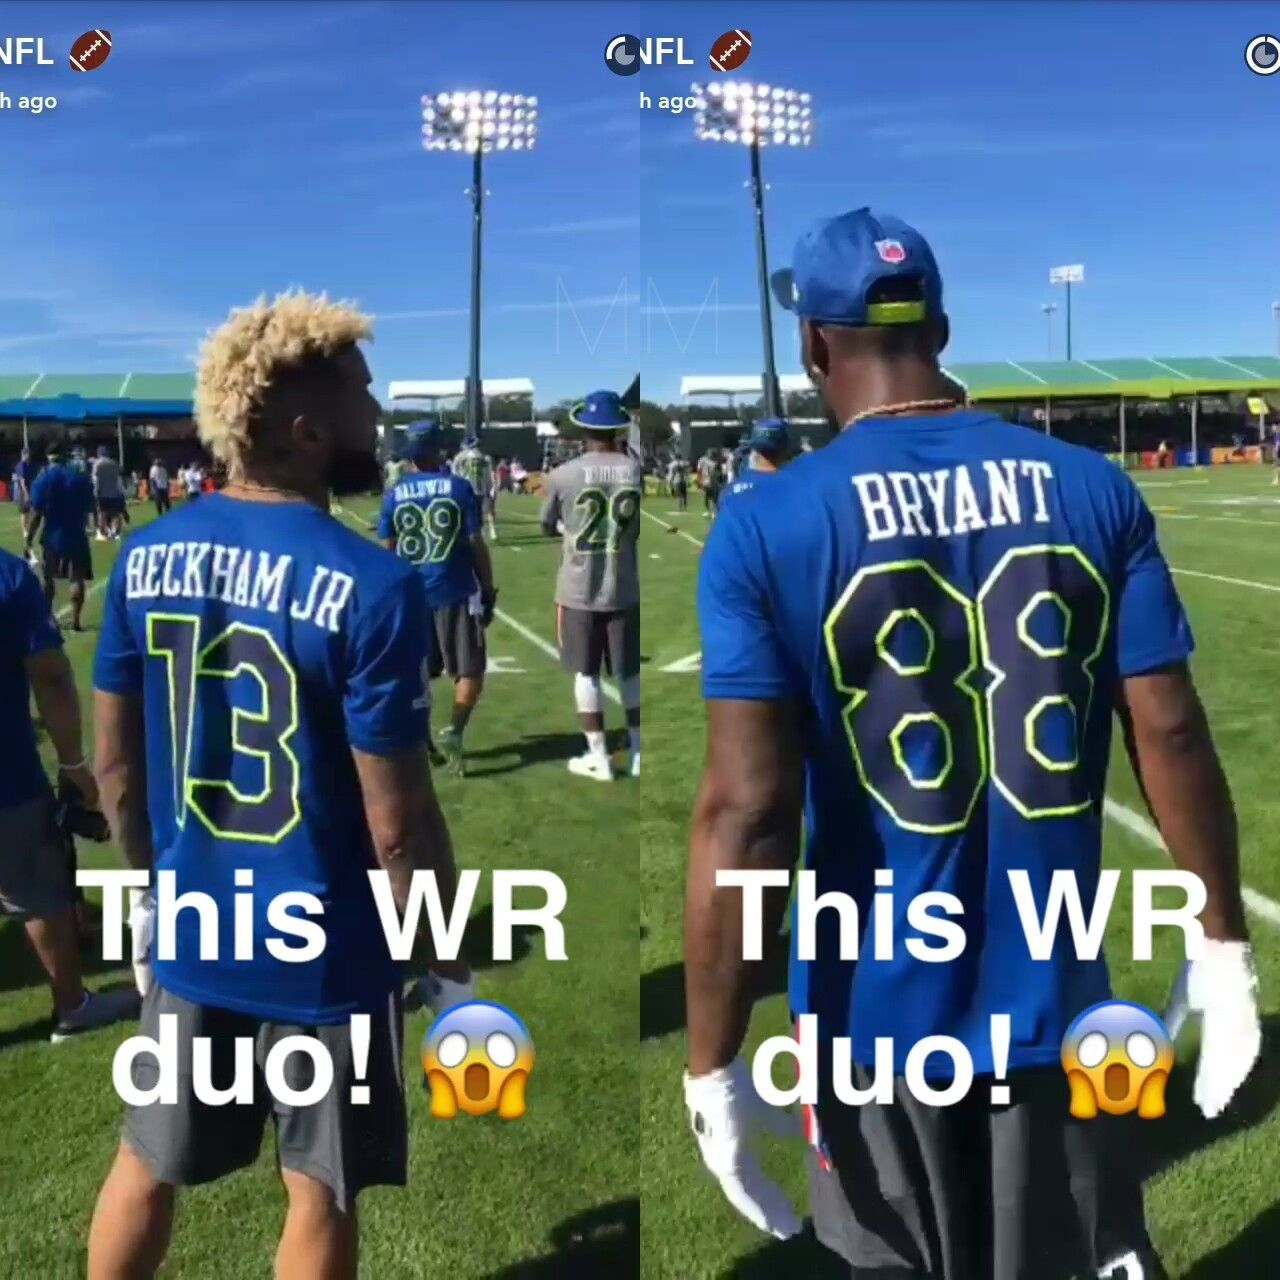 Dez Bryant & Odell Beckham   ● Orlando Fl | Pro Bowl 2017 #dezbryant Dez Bryant & Odell Beckham   ● Orlando Fl | Pro Bowl 2017 #dezbryantjersey Dez Bryant & Odell Beckham   ● Orlando Fl | Pro Bowl 2017 #dezbryant Dez Bryant & Odell Beckham   ● Orlando Fl | Pro Bowl 2017 #dezbryant